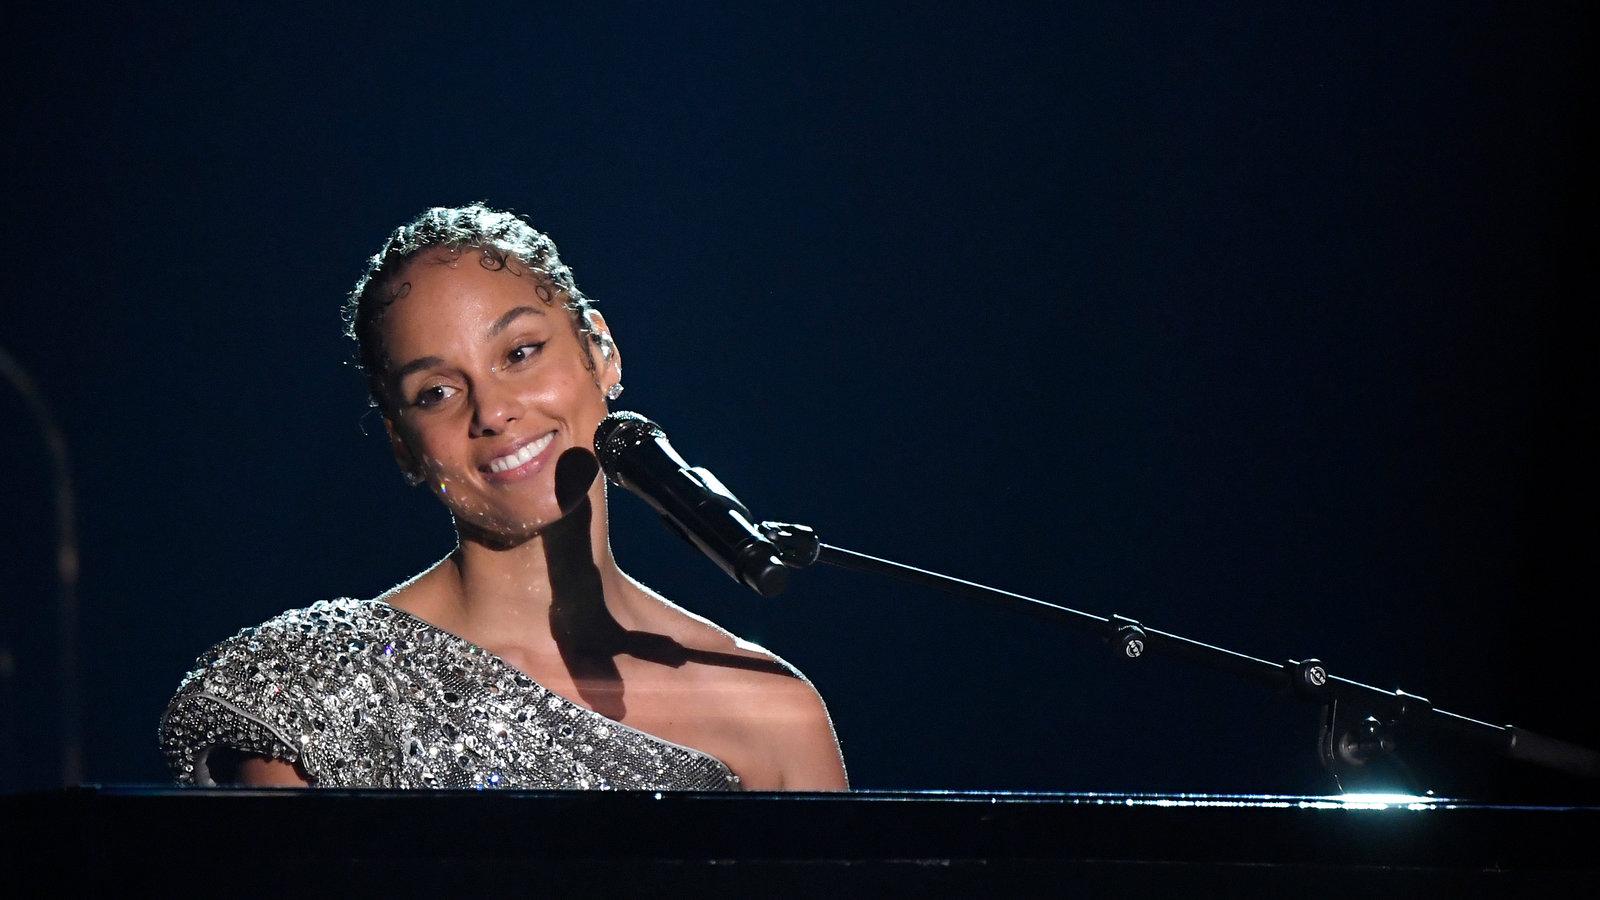 Alicia Keys Seems to Reference Grammys Turmoil in Speech   The New 1600x900